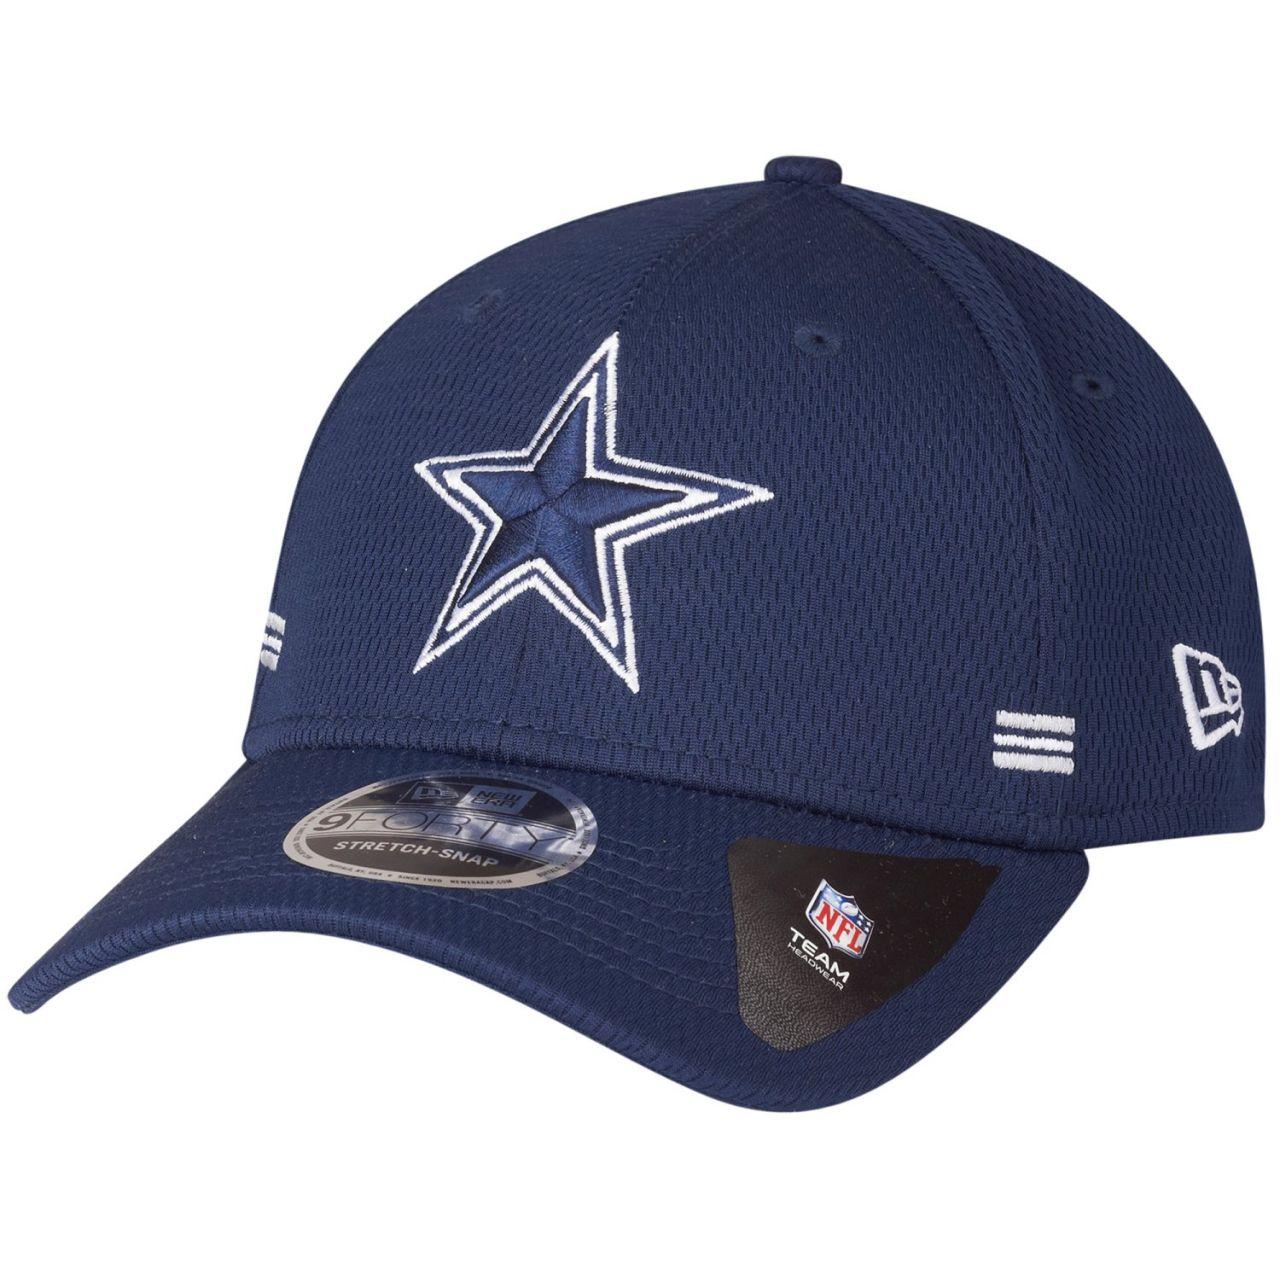 amfoo - New Era 9FORTY Snapback Cap - HOMETOWN Dallas Cowboys